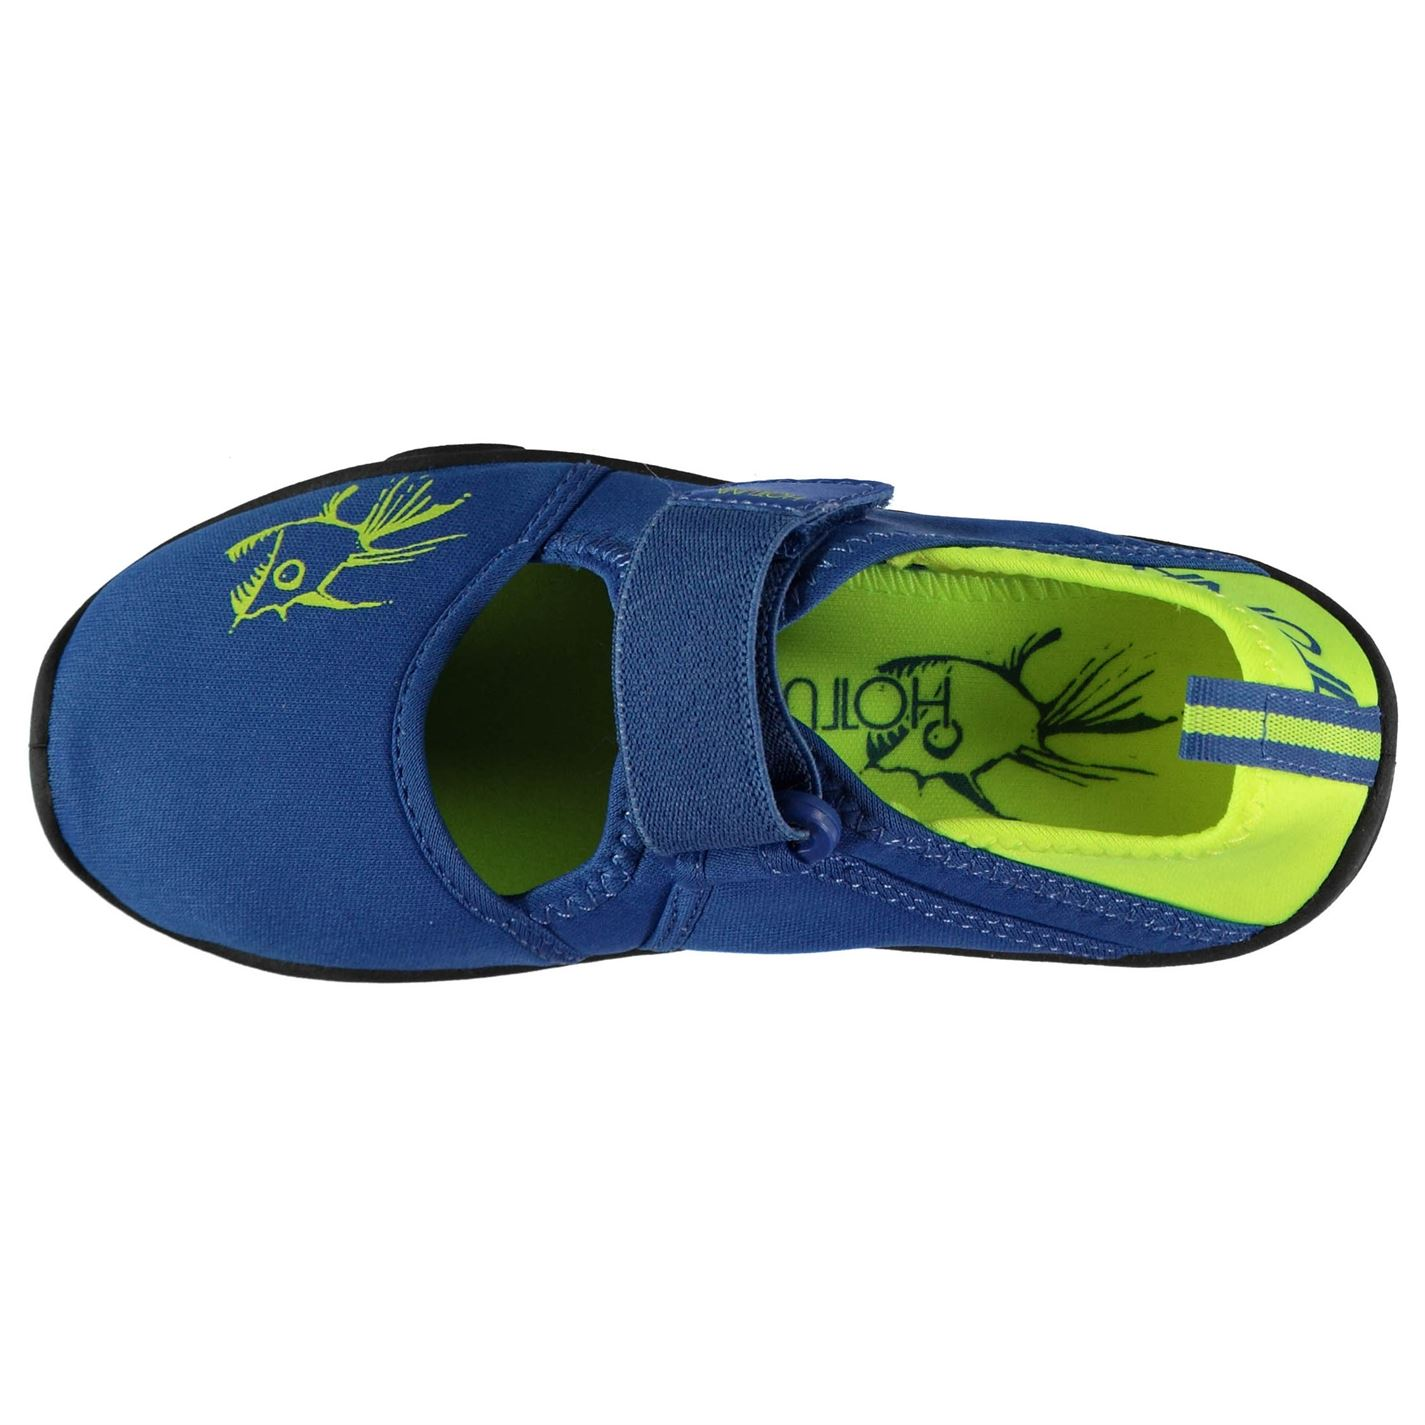 10a56c7eaa2b Hot-Tuna-Kids-Childrens-Aqua-Shoes-Splasher thumbnail 10